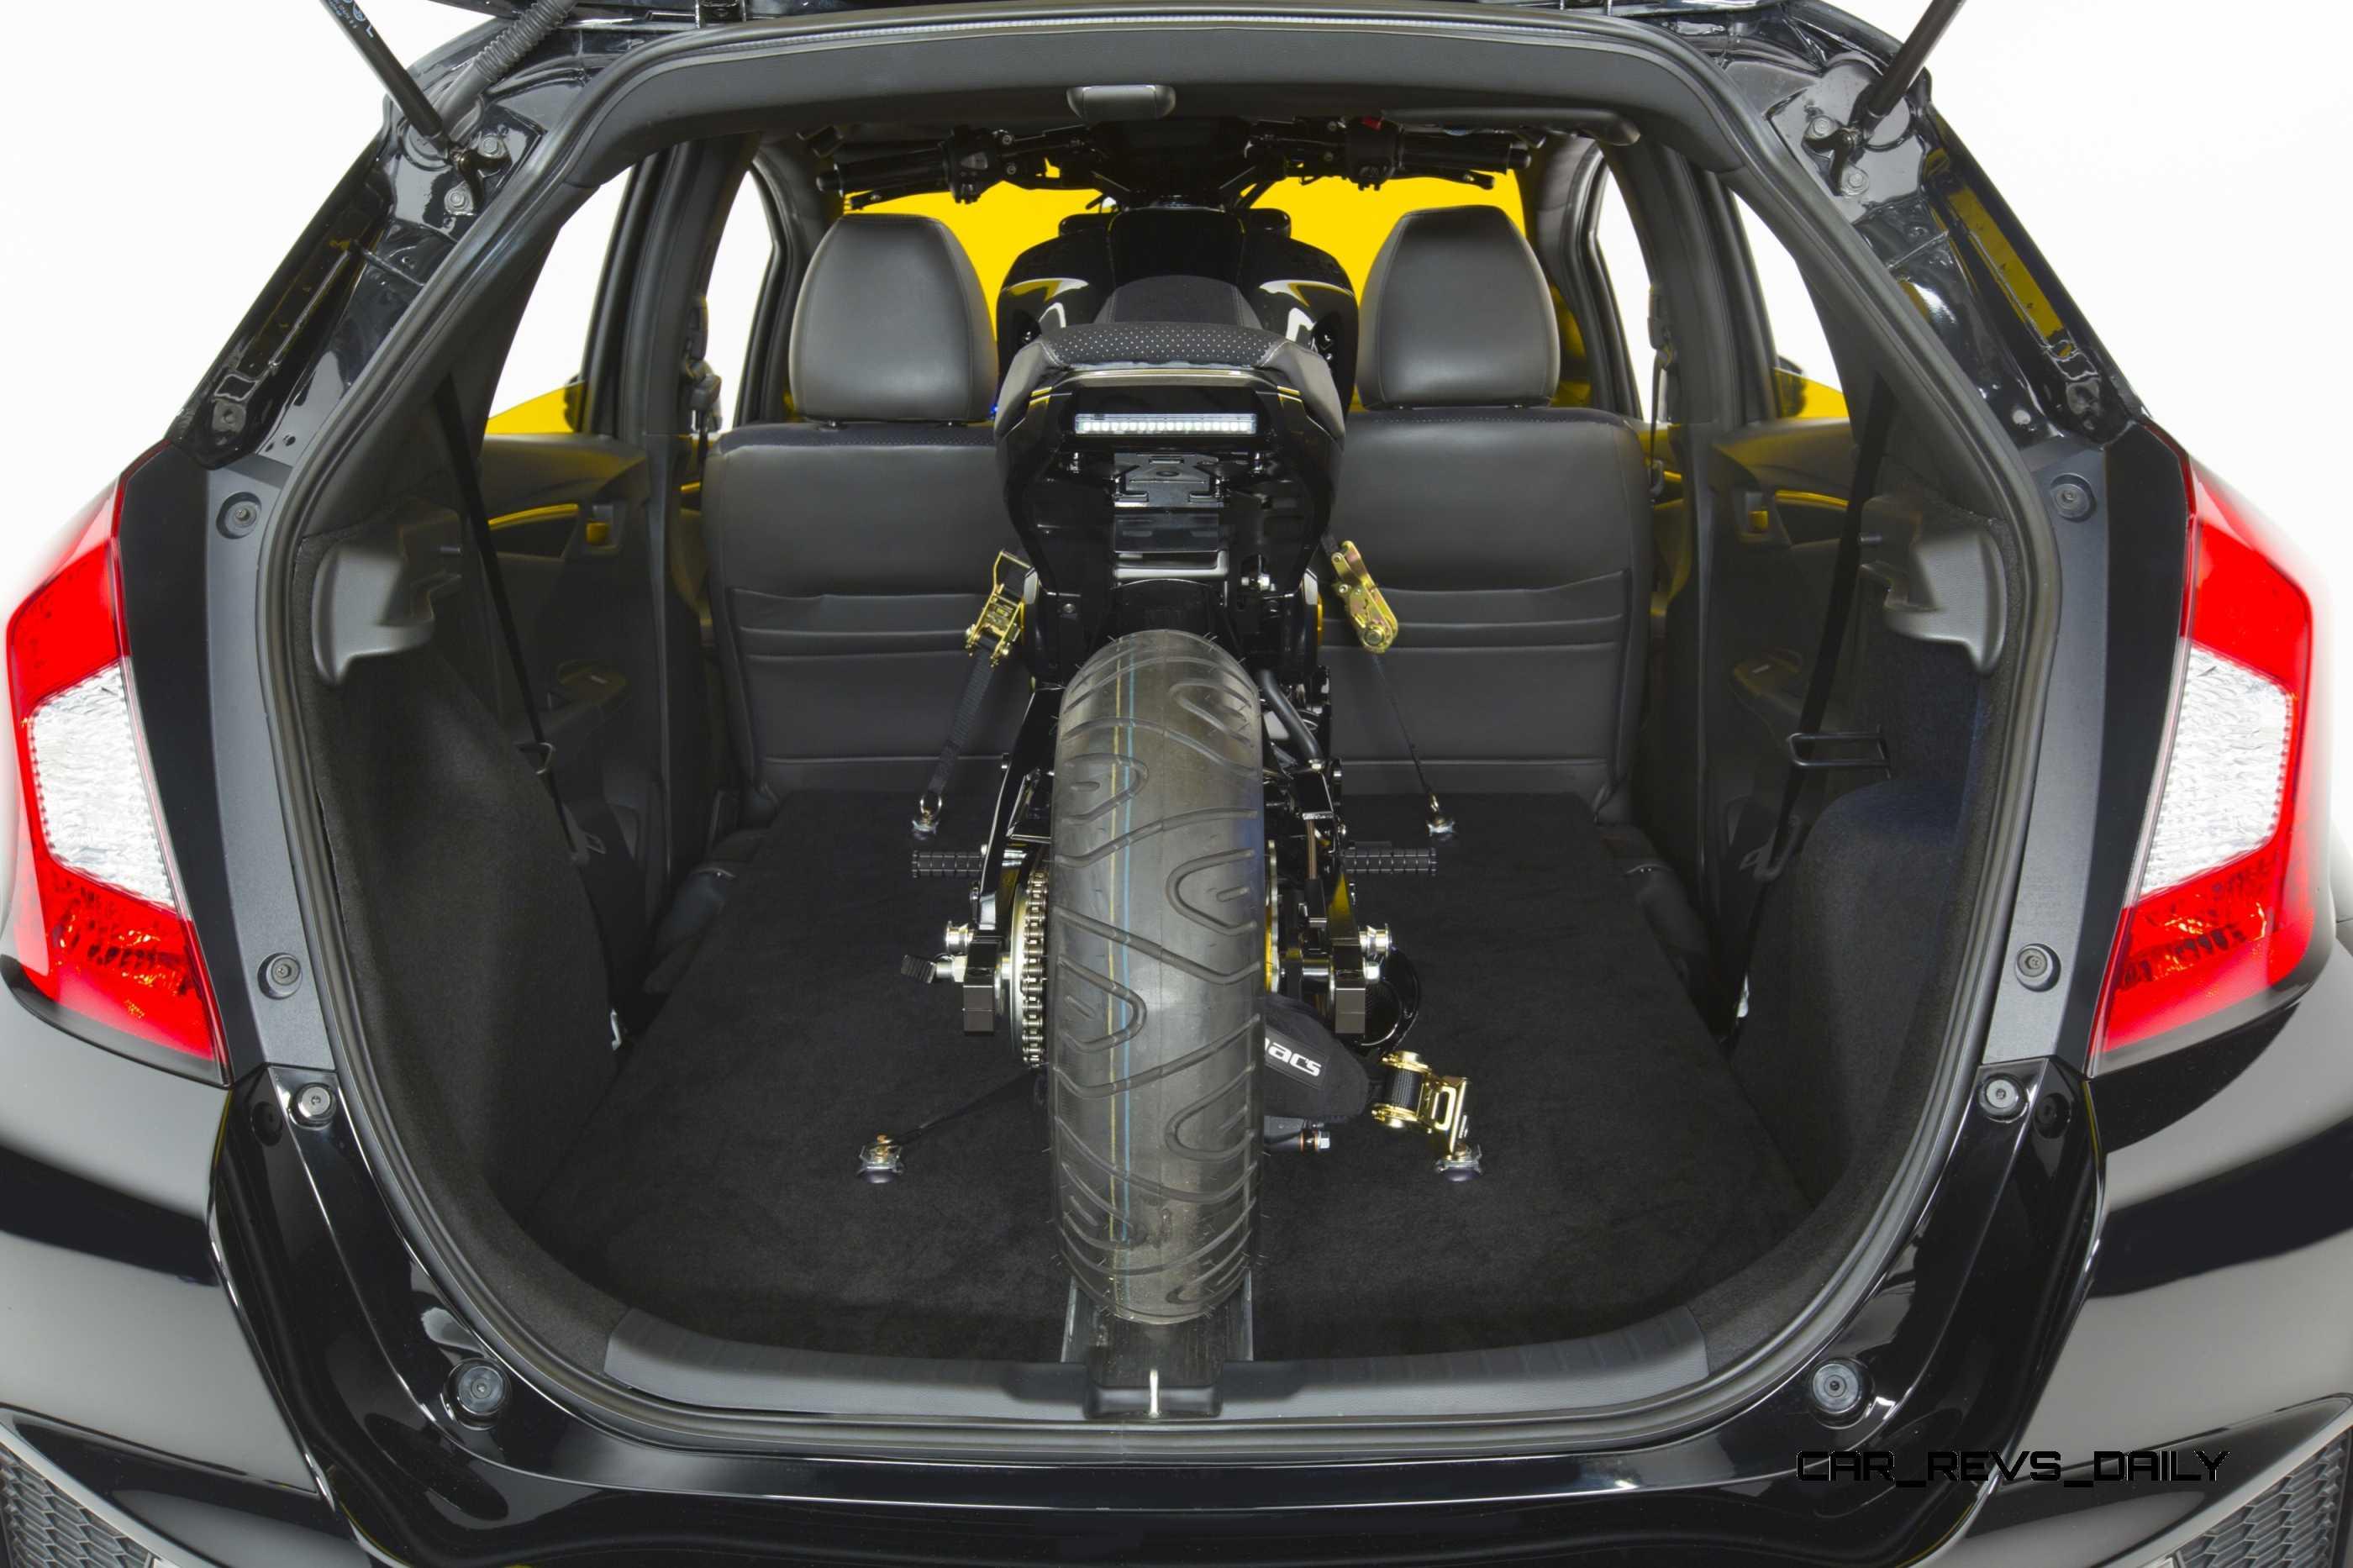 Best Of Sema 2014 Honda Fit In 7 Race Ready Customs